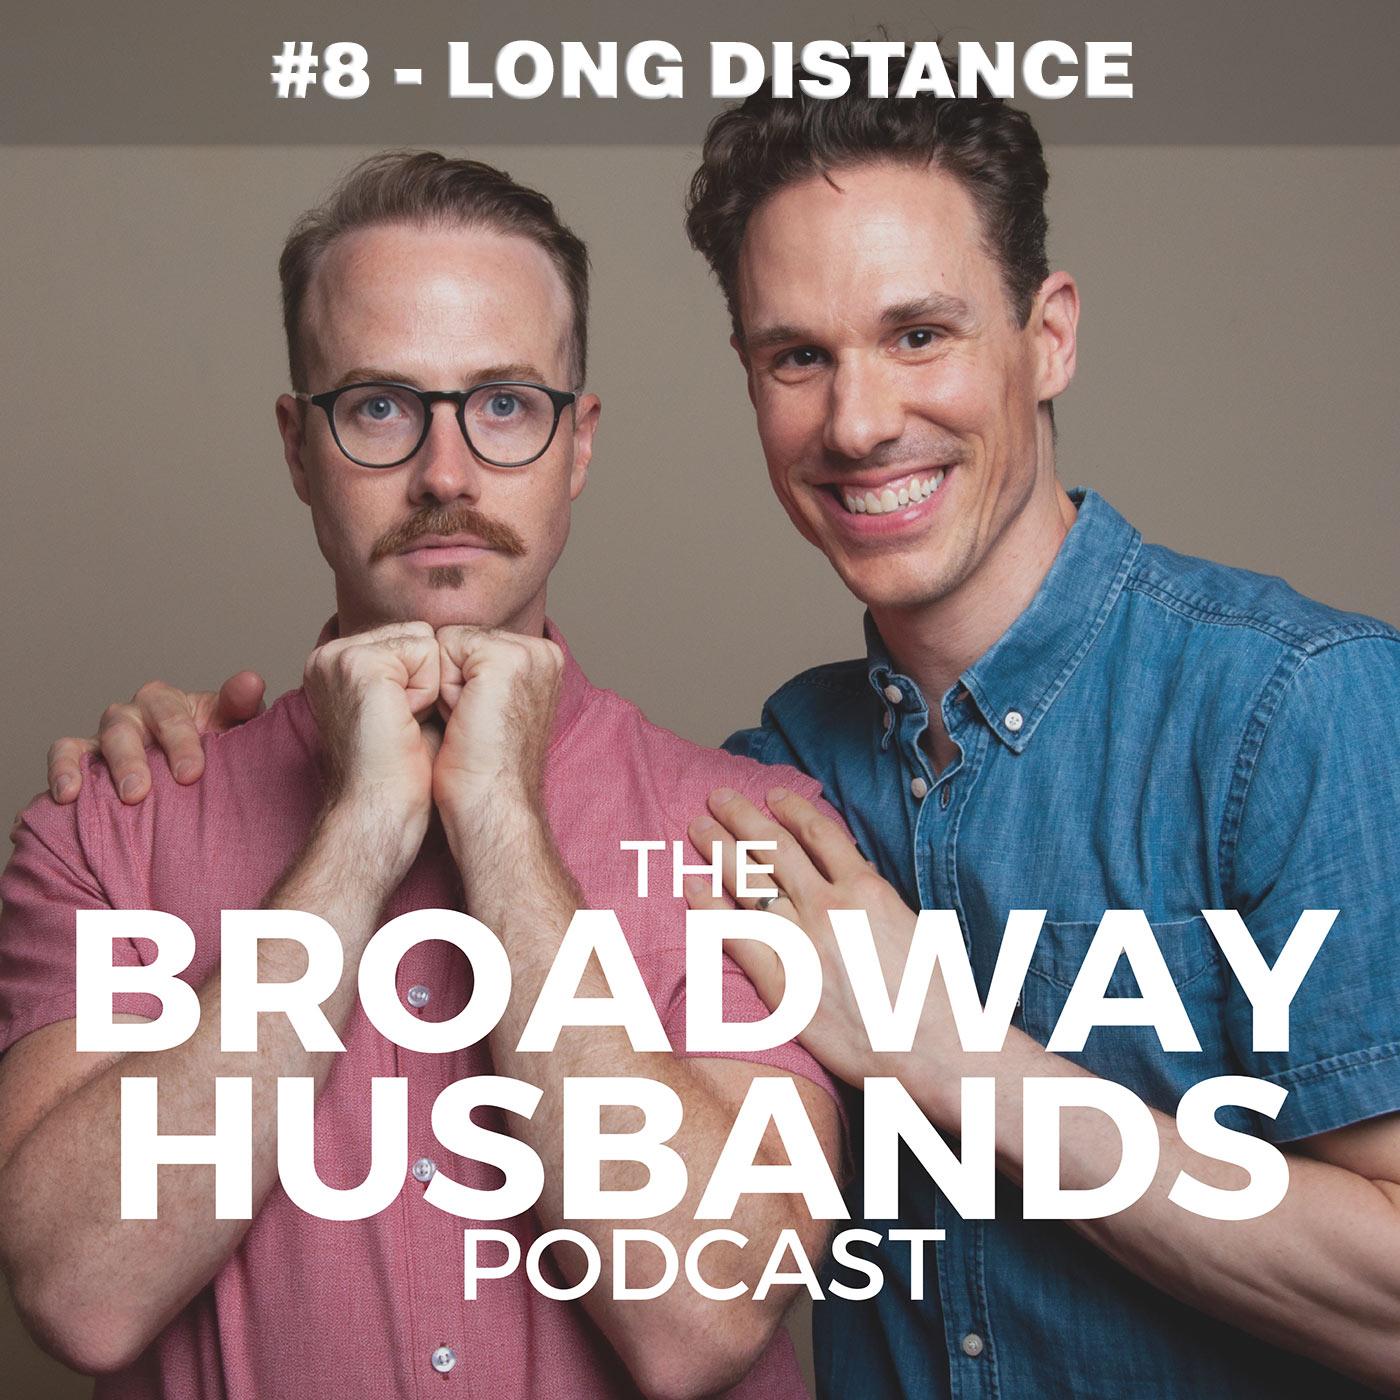 the Broadway Husbands Episode 8 Long Distance